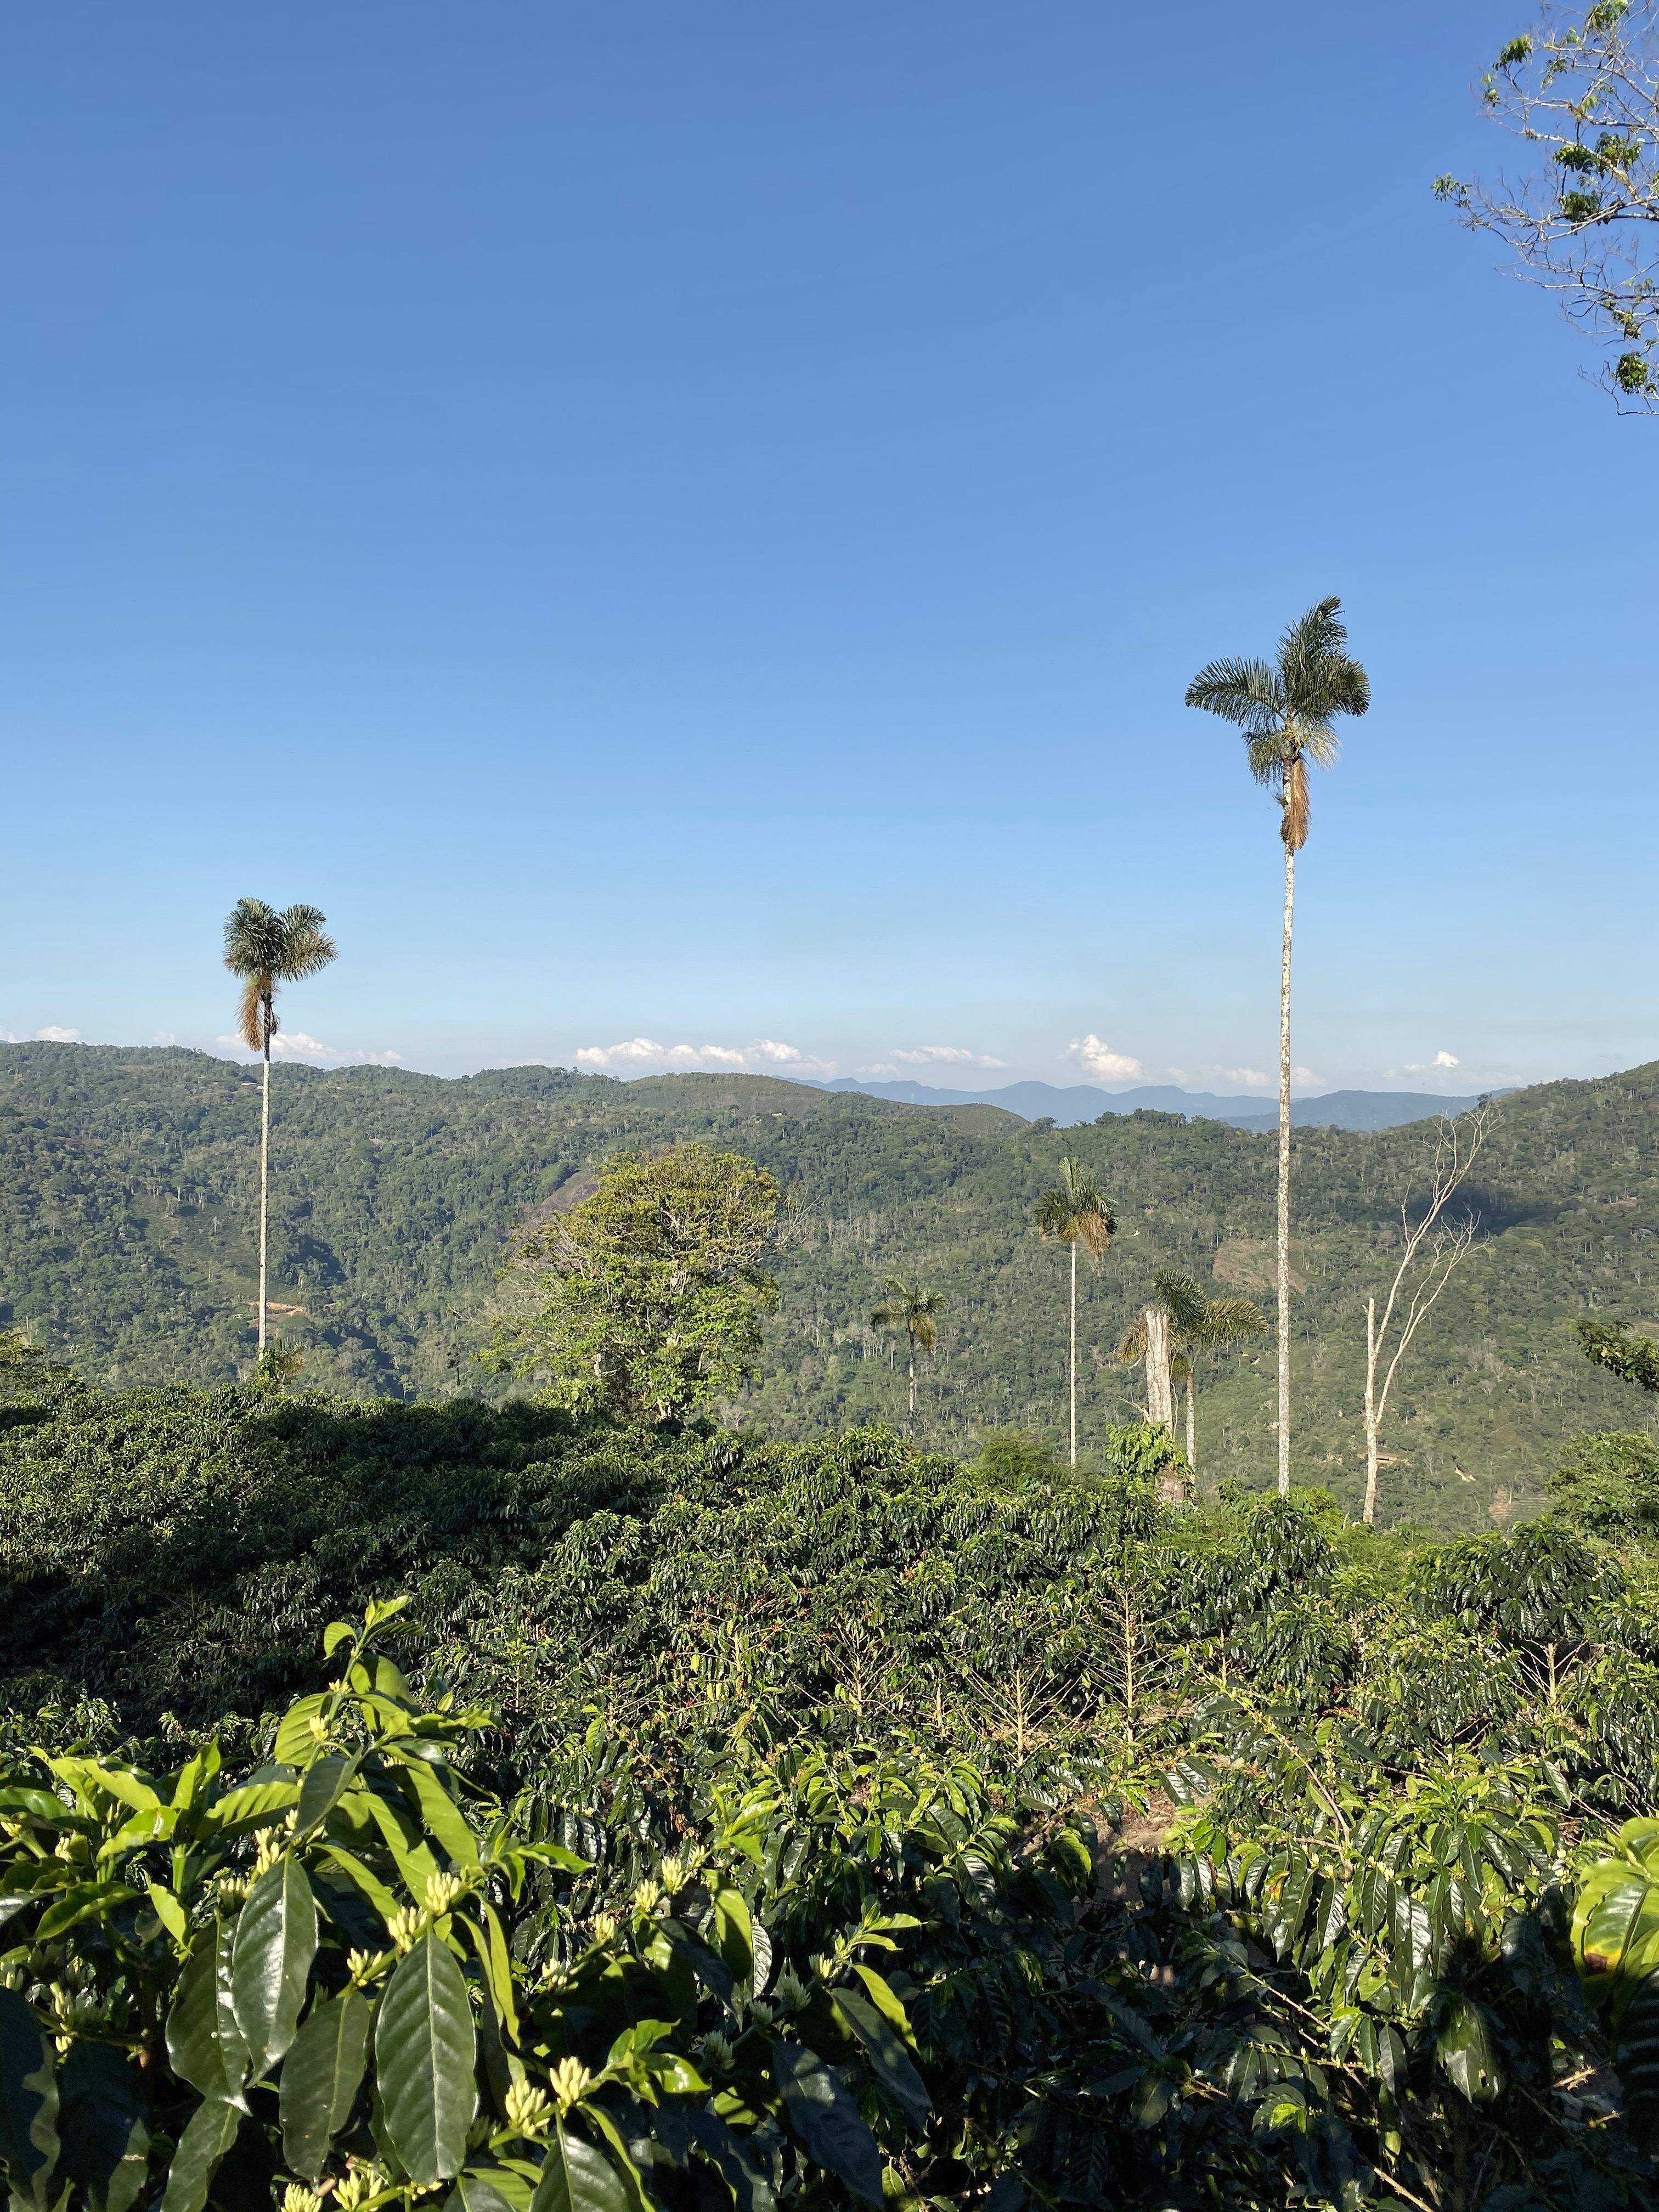 The area in Caranavi